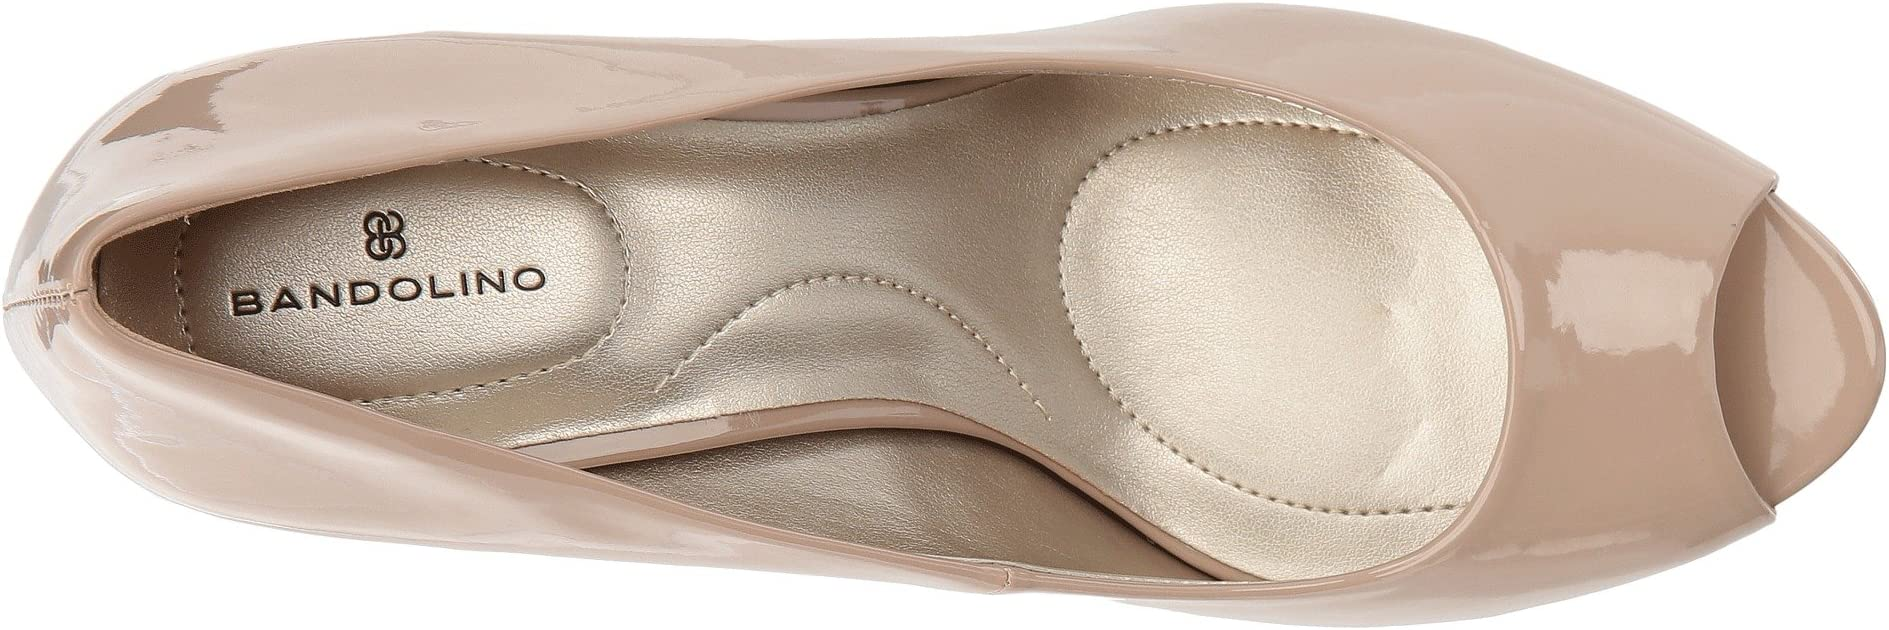 Bandolino Baccanti | Women's shoes | 2020 Newest